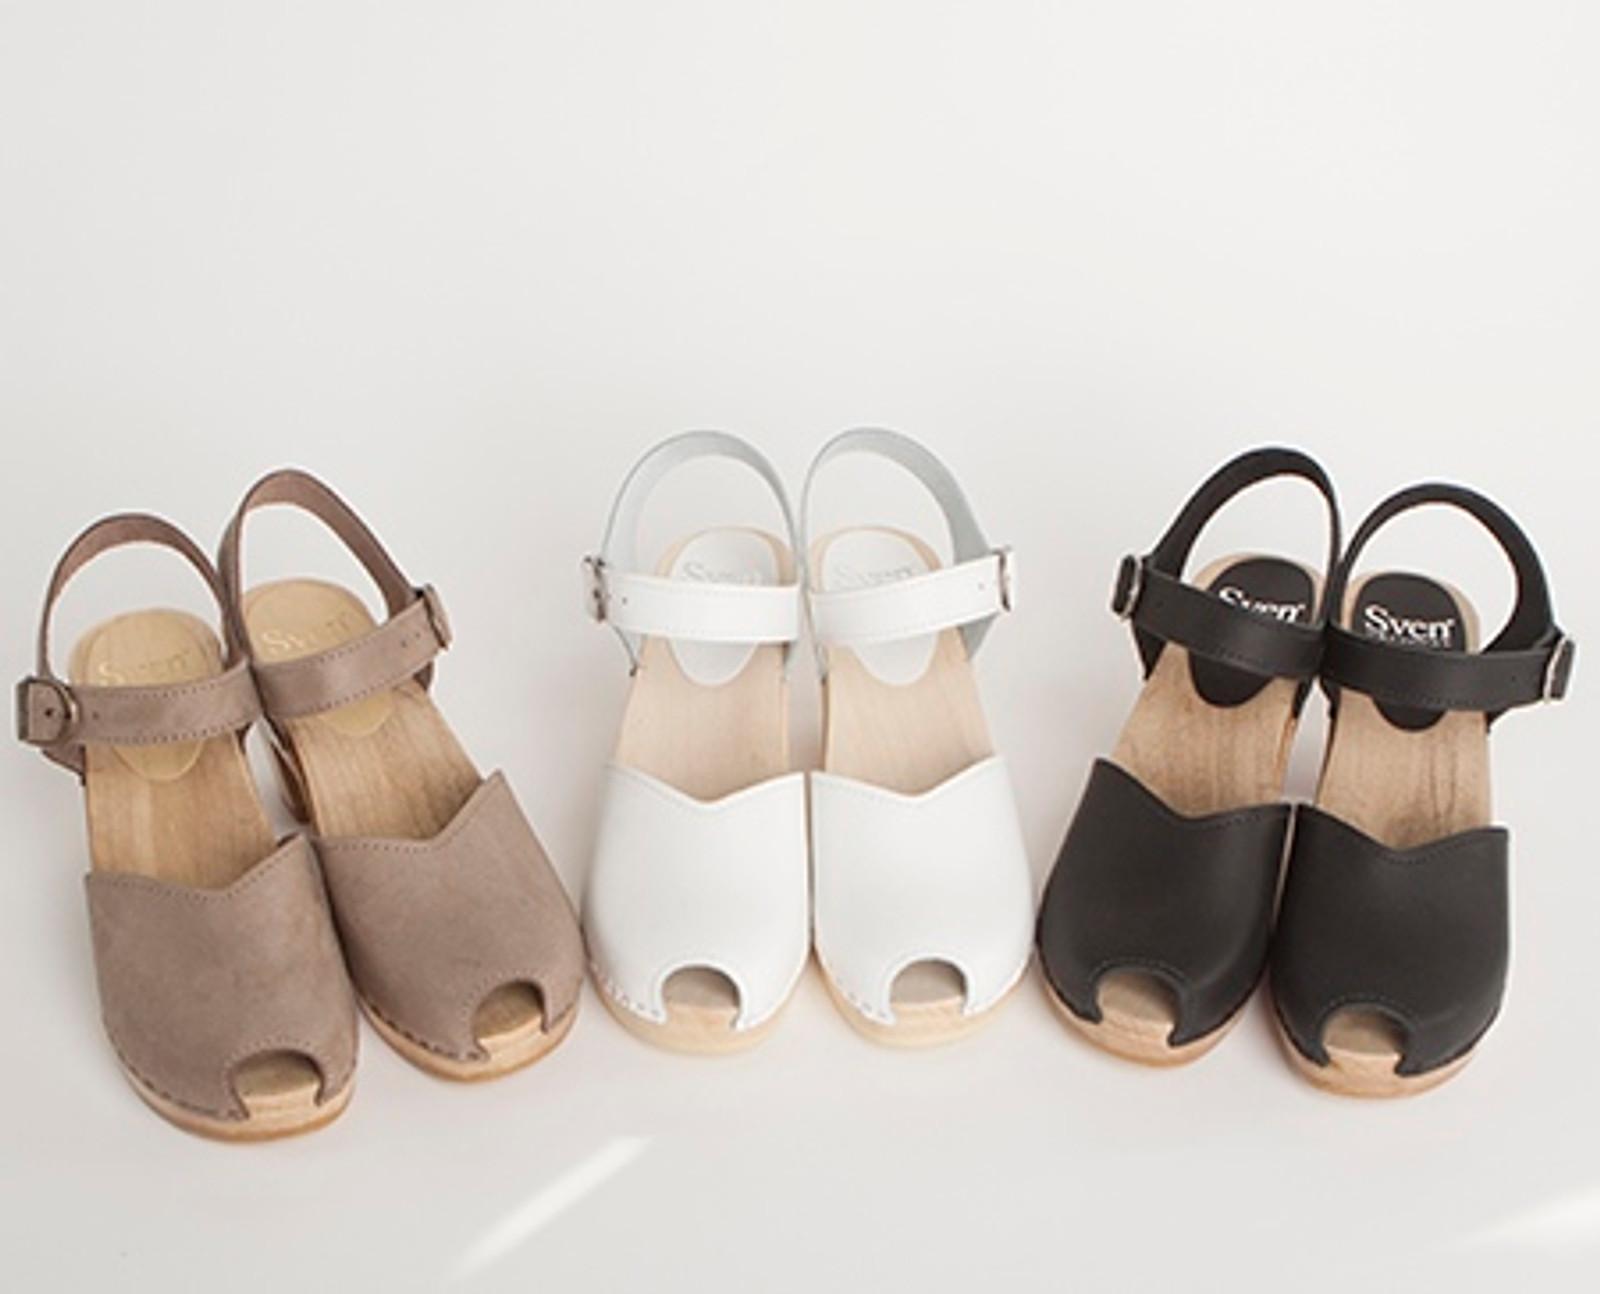 Mary Jane Clogs - Peep Toes - High Heels